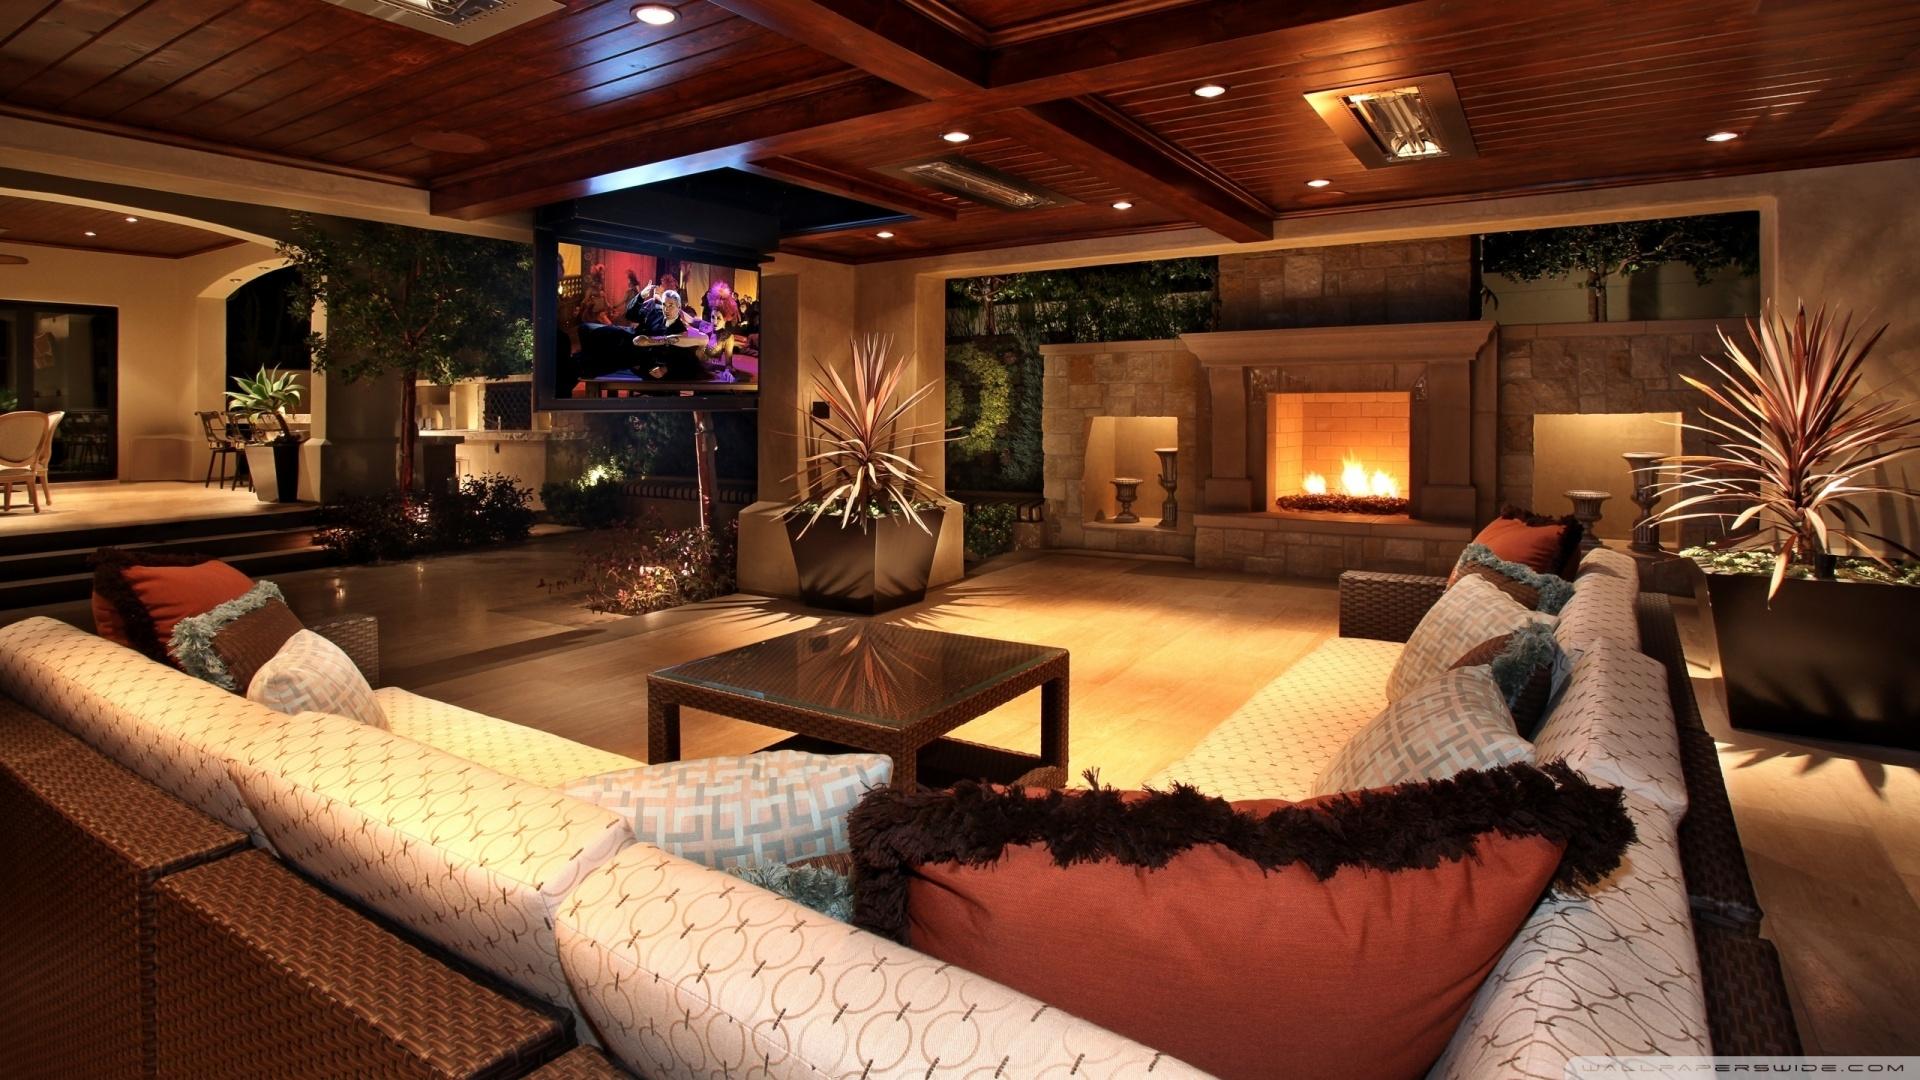 Luxury House Interior Wallpaper 1920x1080 Luxury House Interior 1920x1080